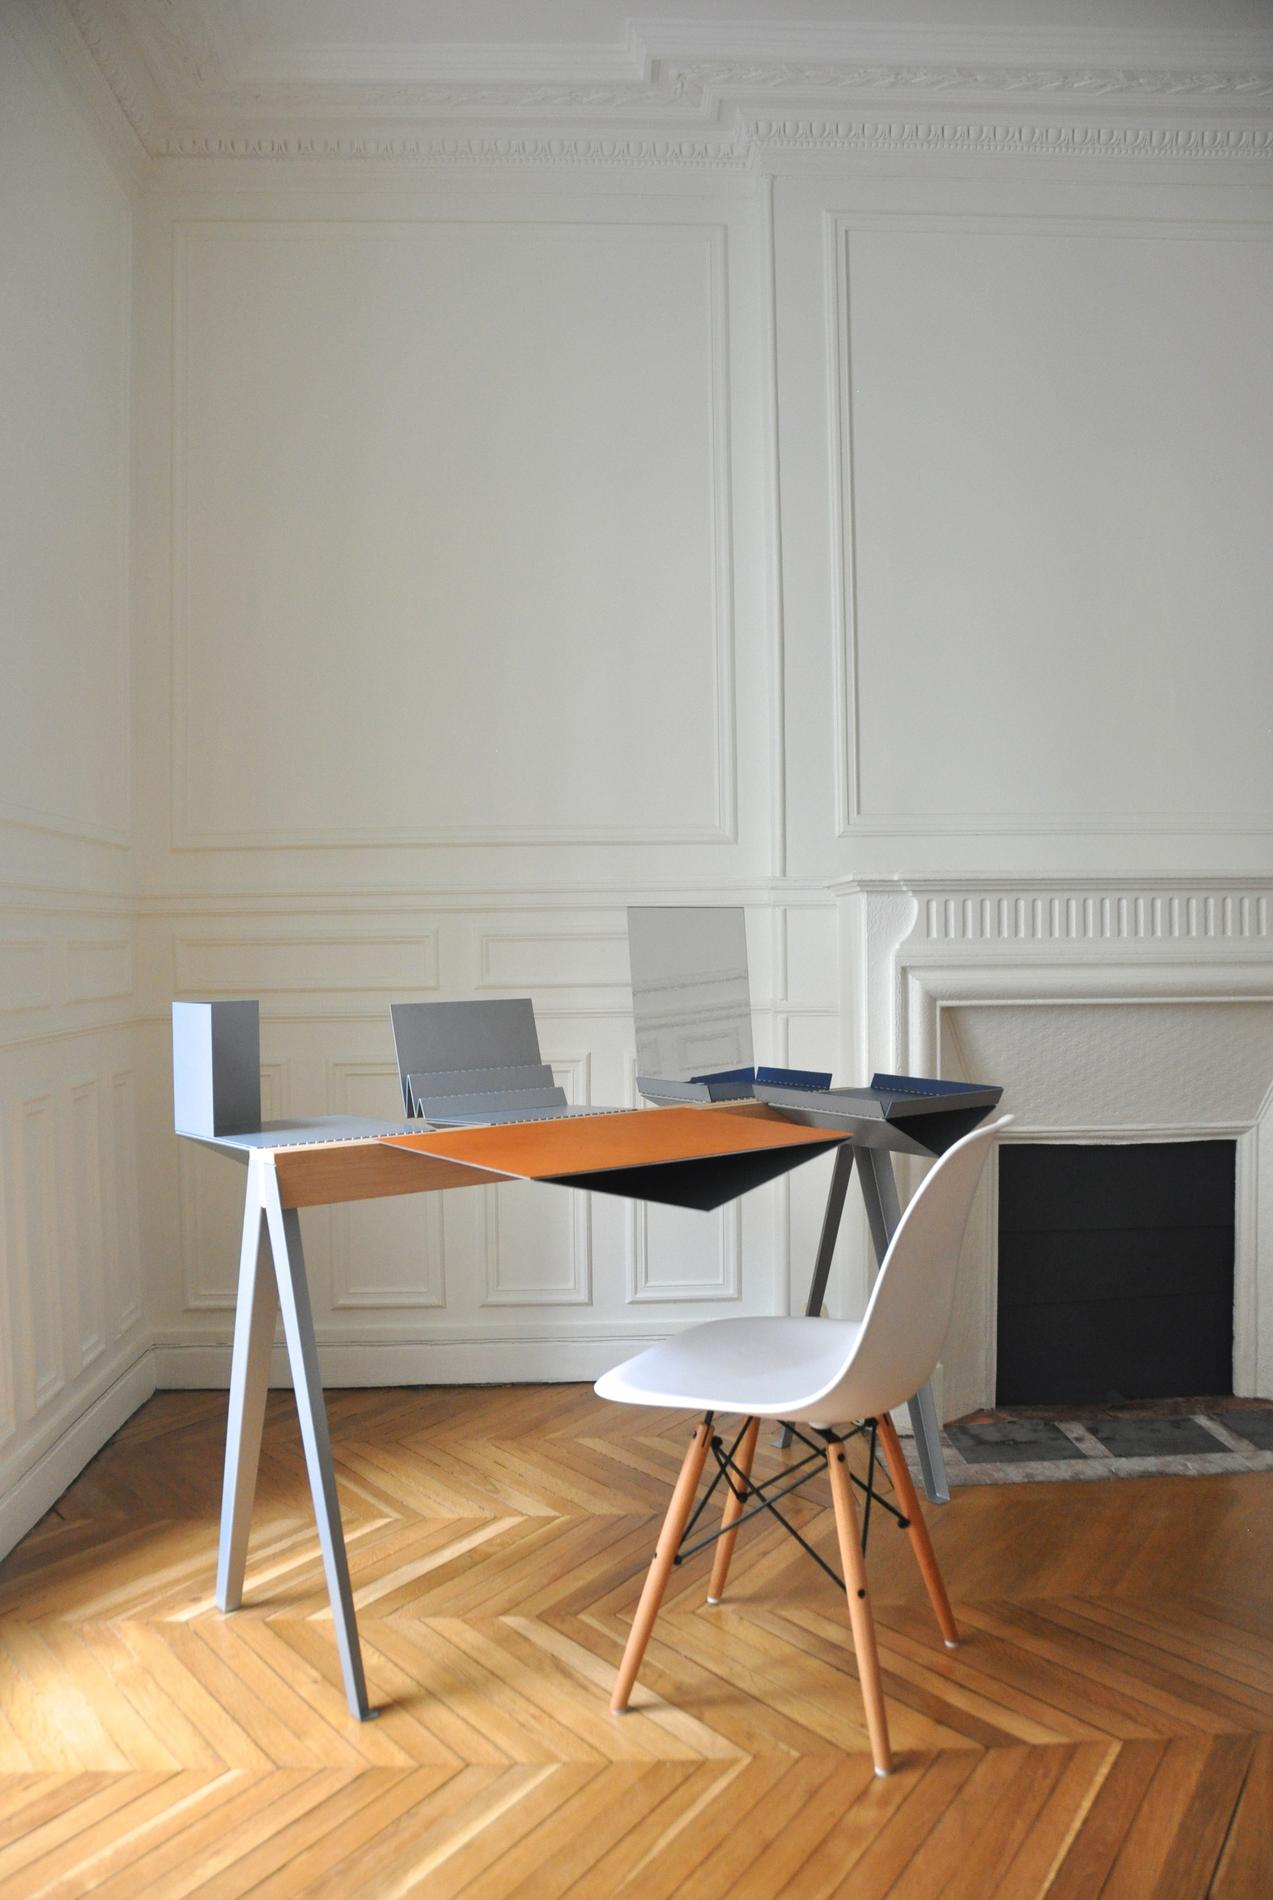 paris design week 2016 la capitale soigne son apparence. Black Bedroom Furniture Sets. Home Design Ideas